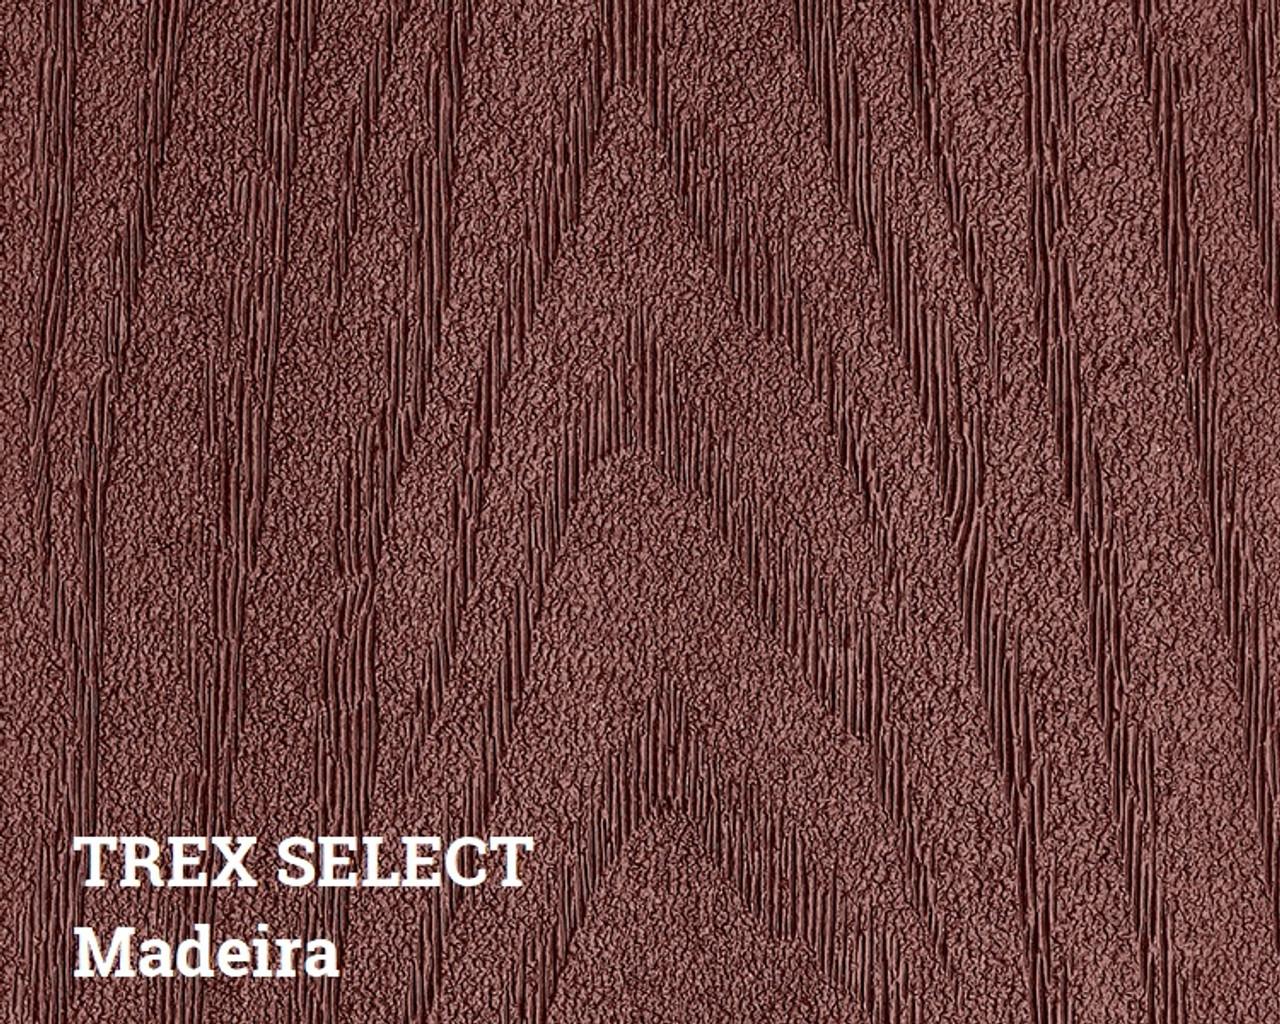 Trex Select Madeira Decking Surface